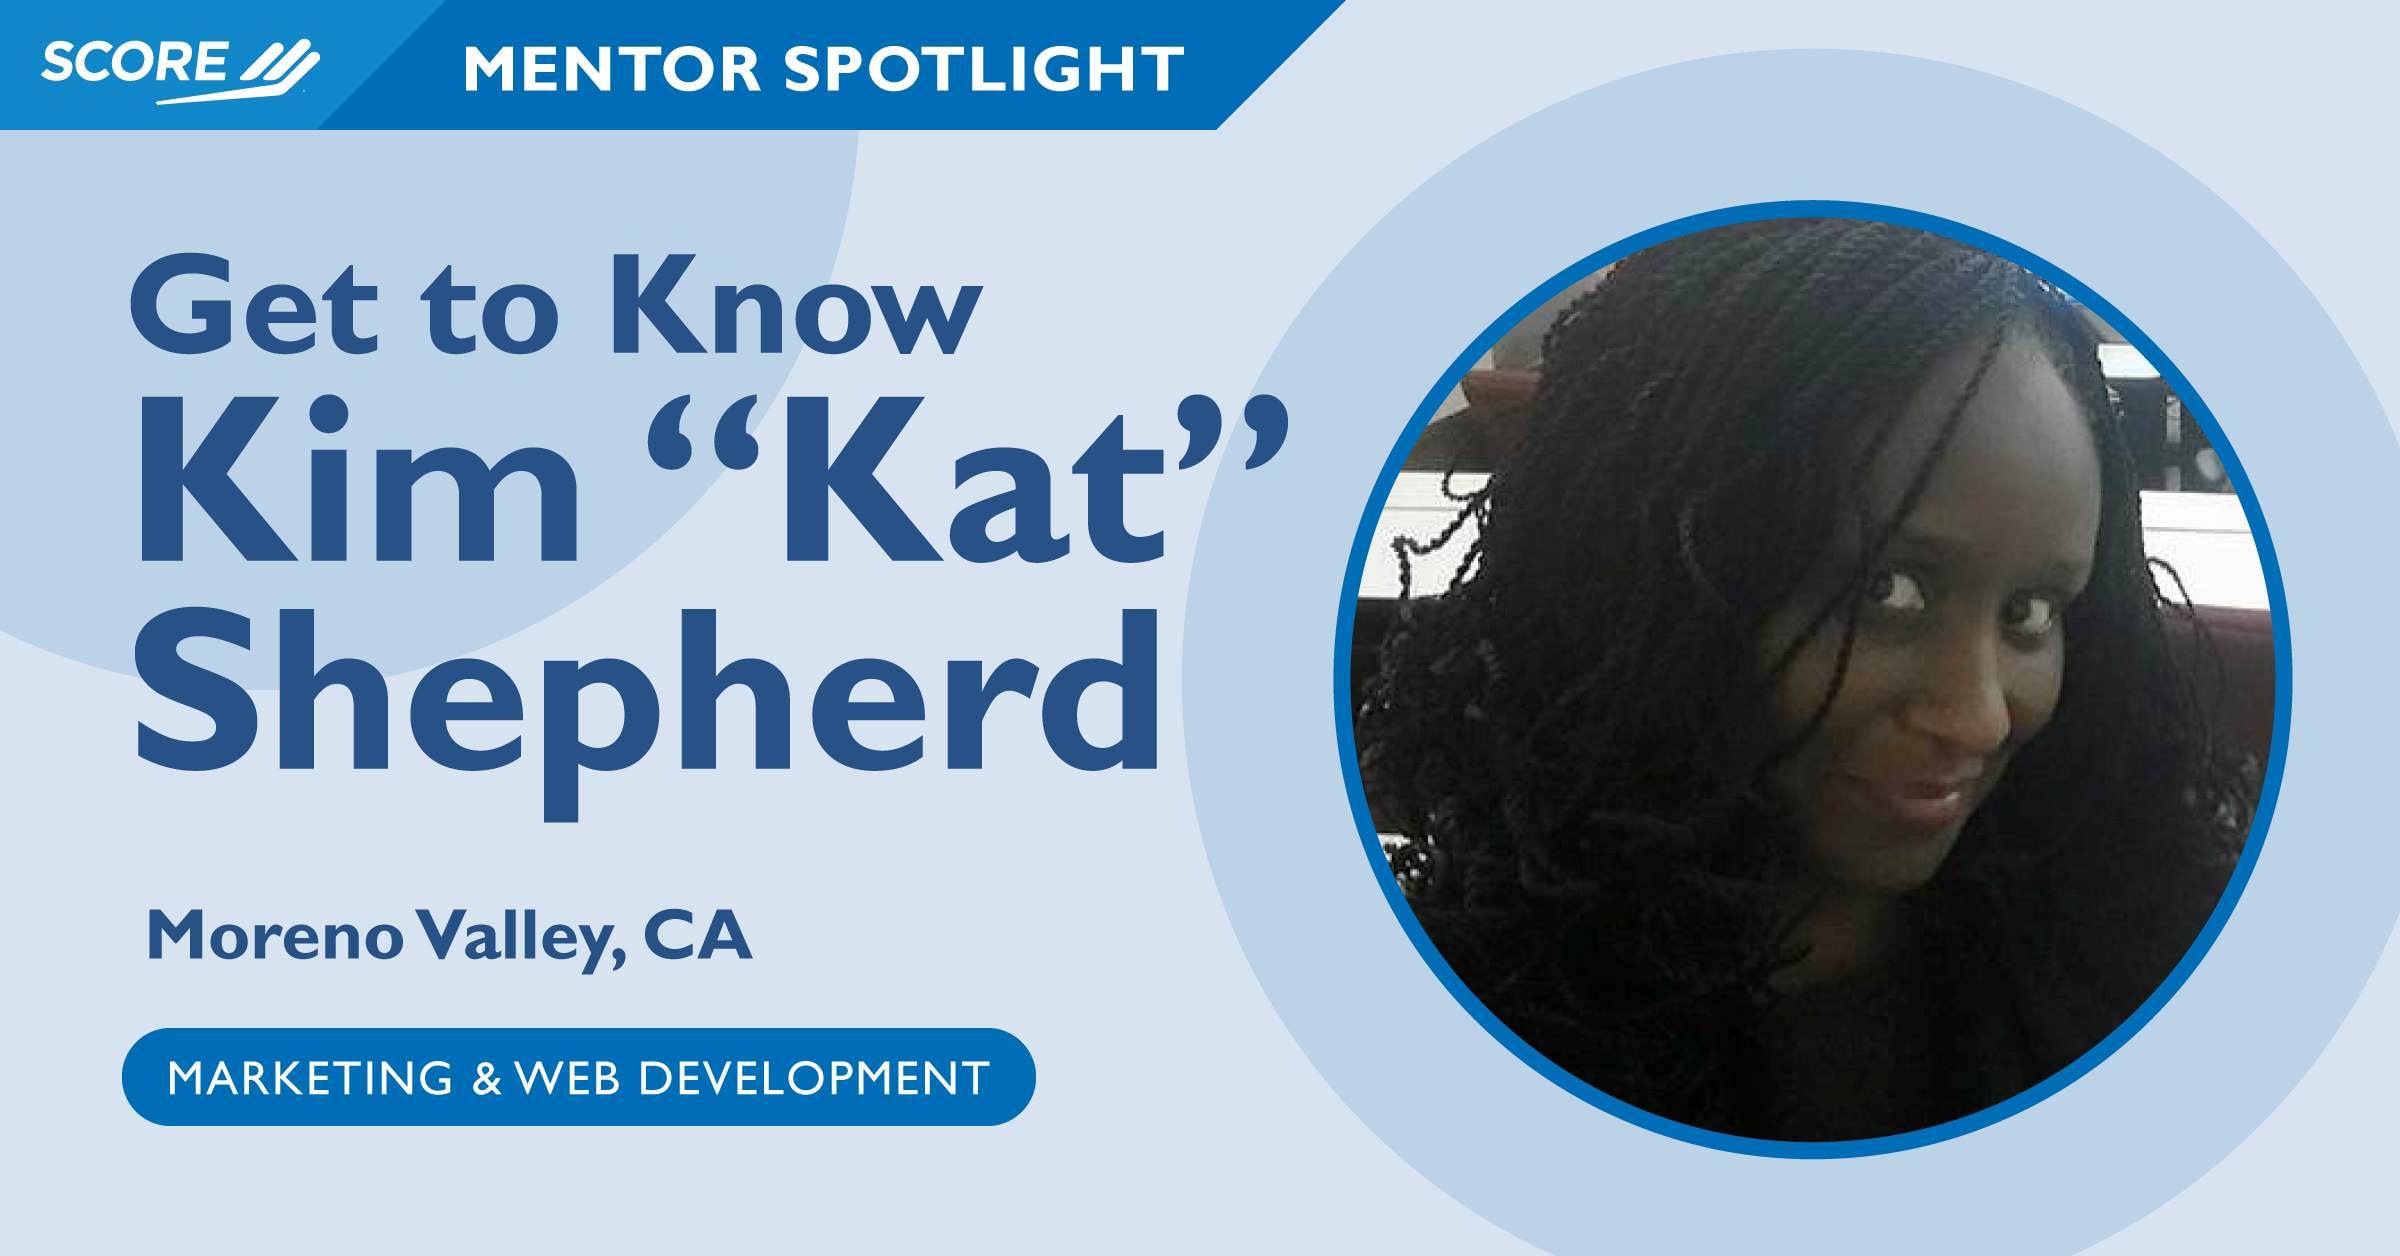 Mentor Spotlight - Kim Shepherd